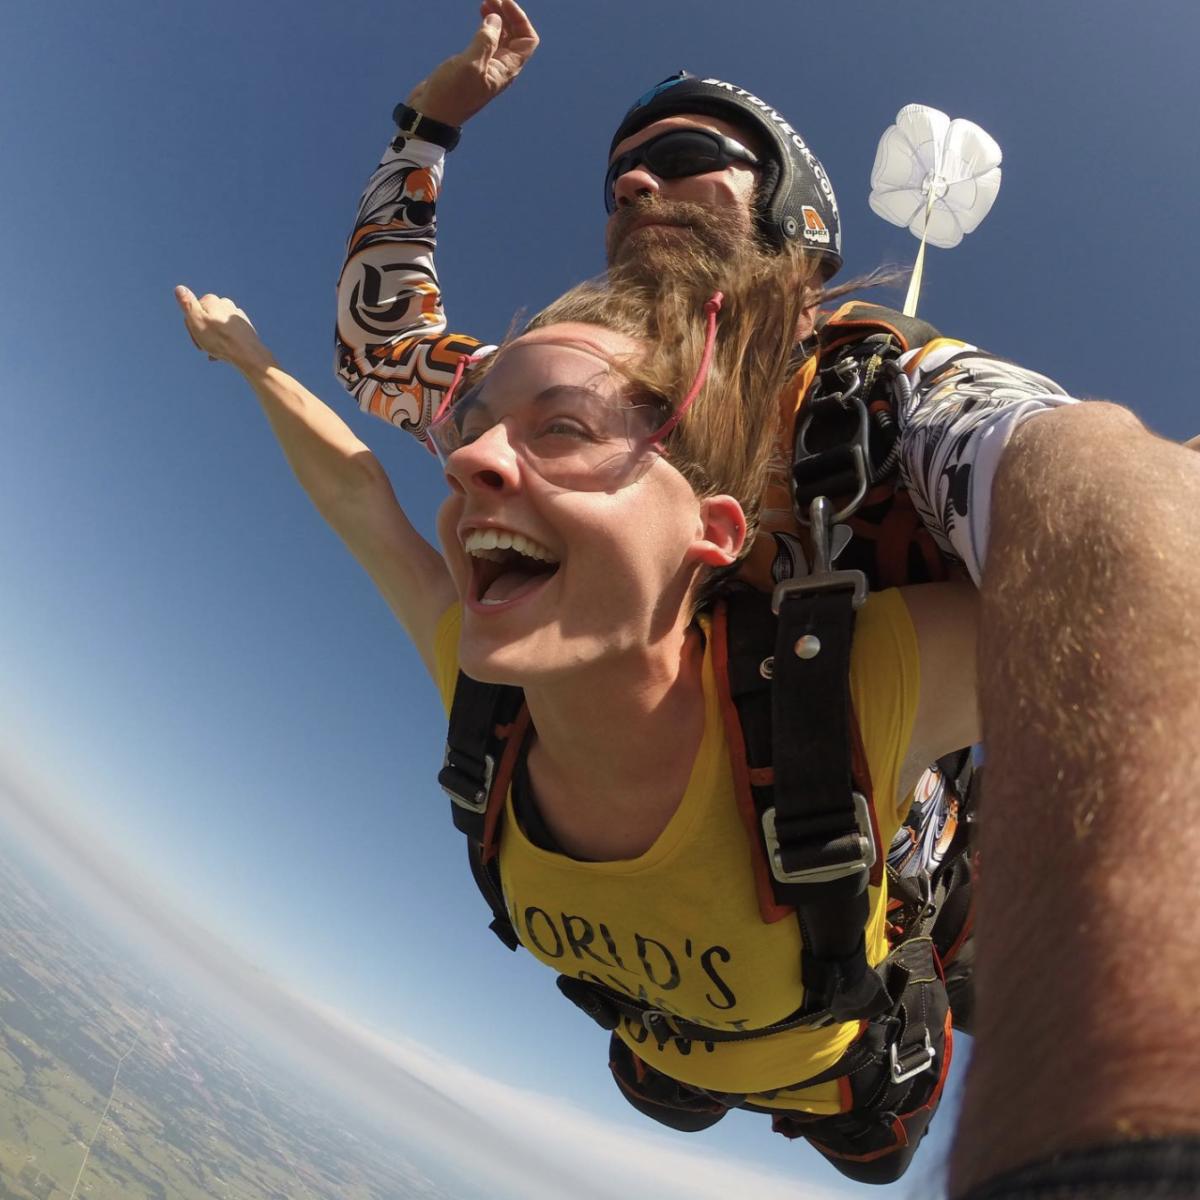 How Safe is Tandem Skydiving?